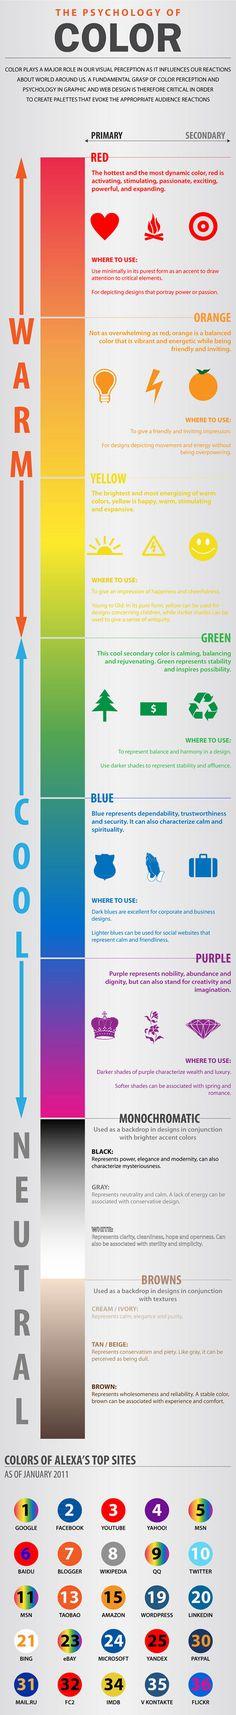 Infographic: The Psychology of Color for Web Design - Print Media Centr Graphisches Design, Logo Design, Design Color, Design Layouts, Flat Design, Branding Design, Design Ideas, Photoshop, Info Board